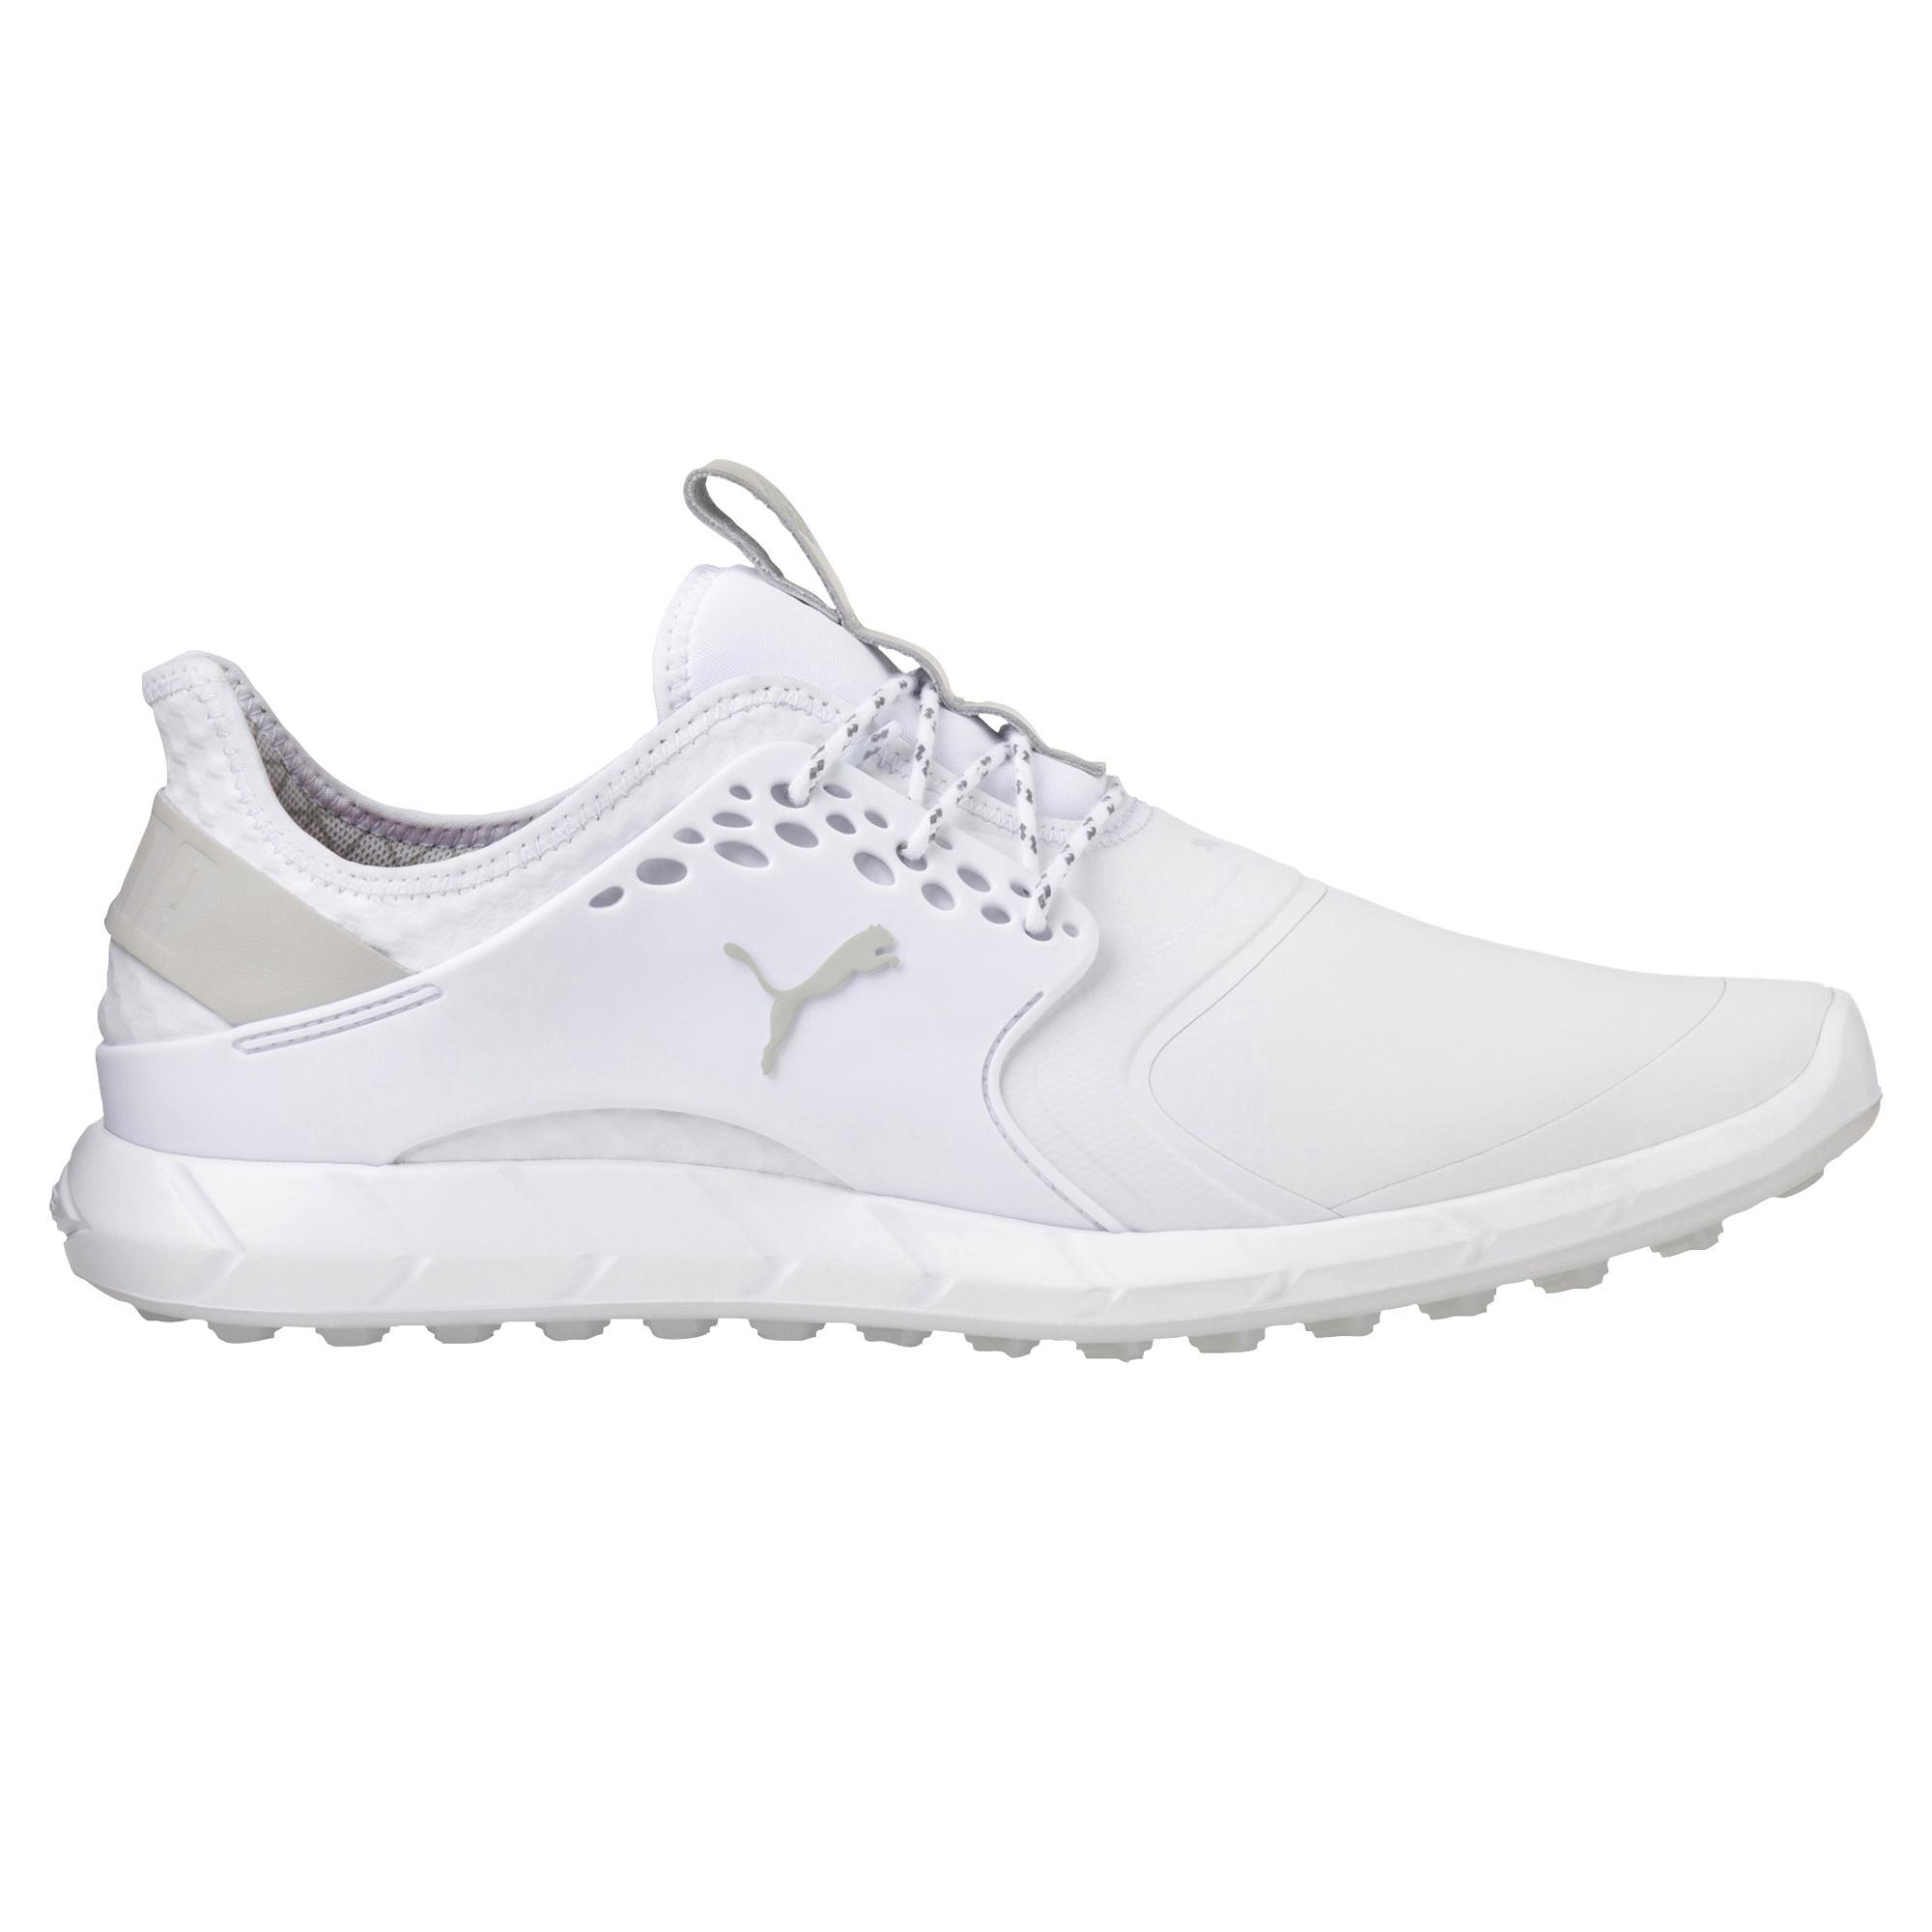 Men's Ignite Pwrsport Pro Spikeless Golf Shoe